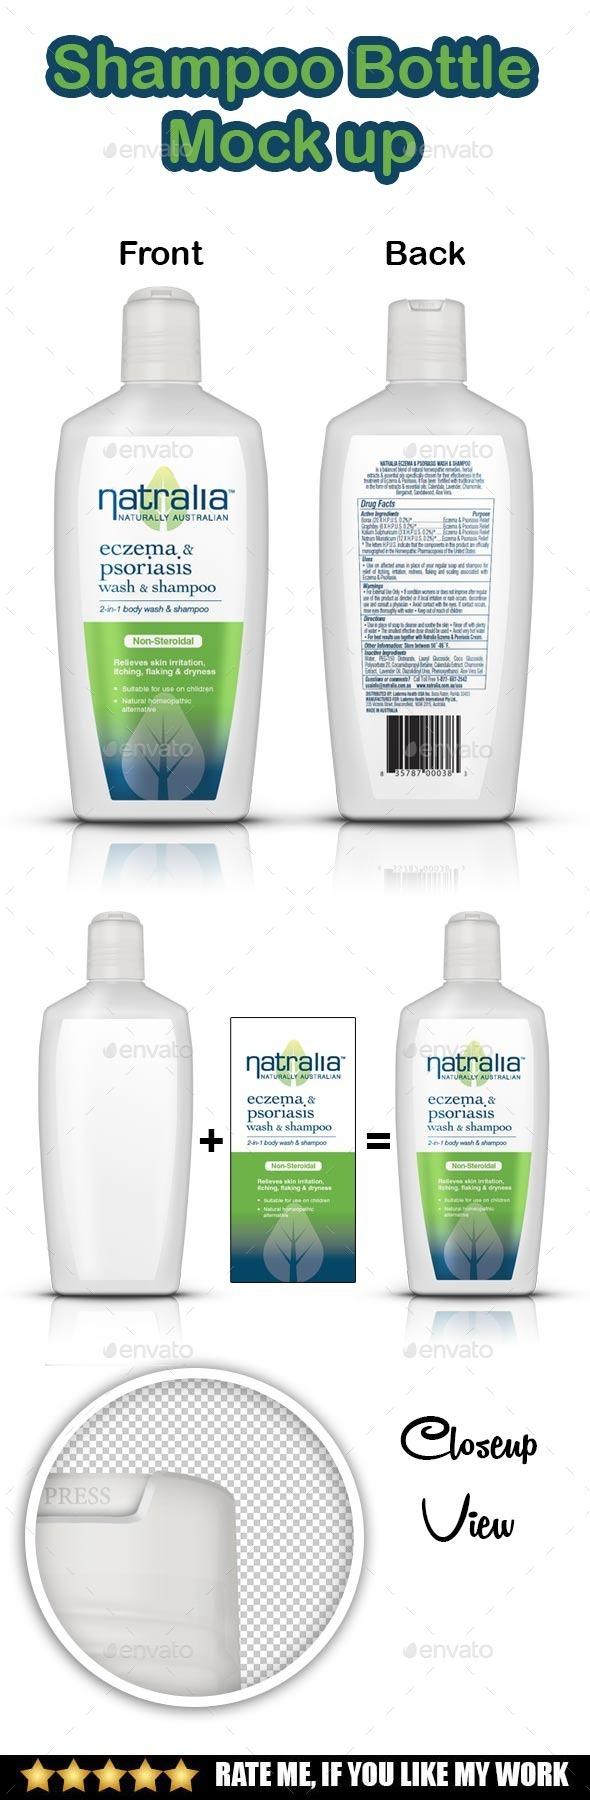 Shampoo Bottle Mockup - Product Mock-Ups Graphics